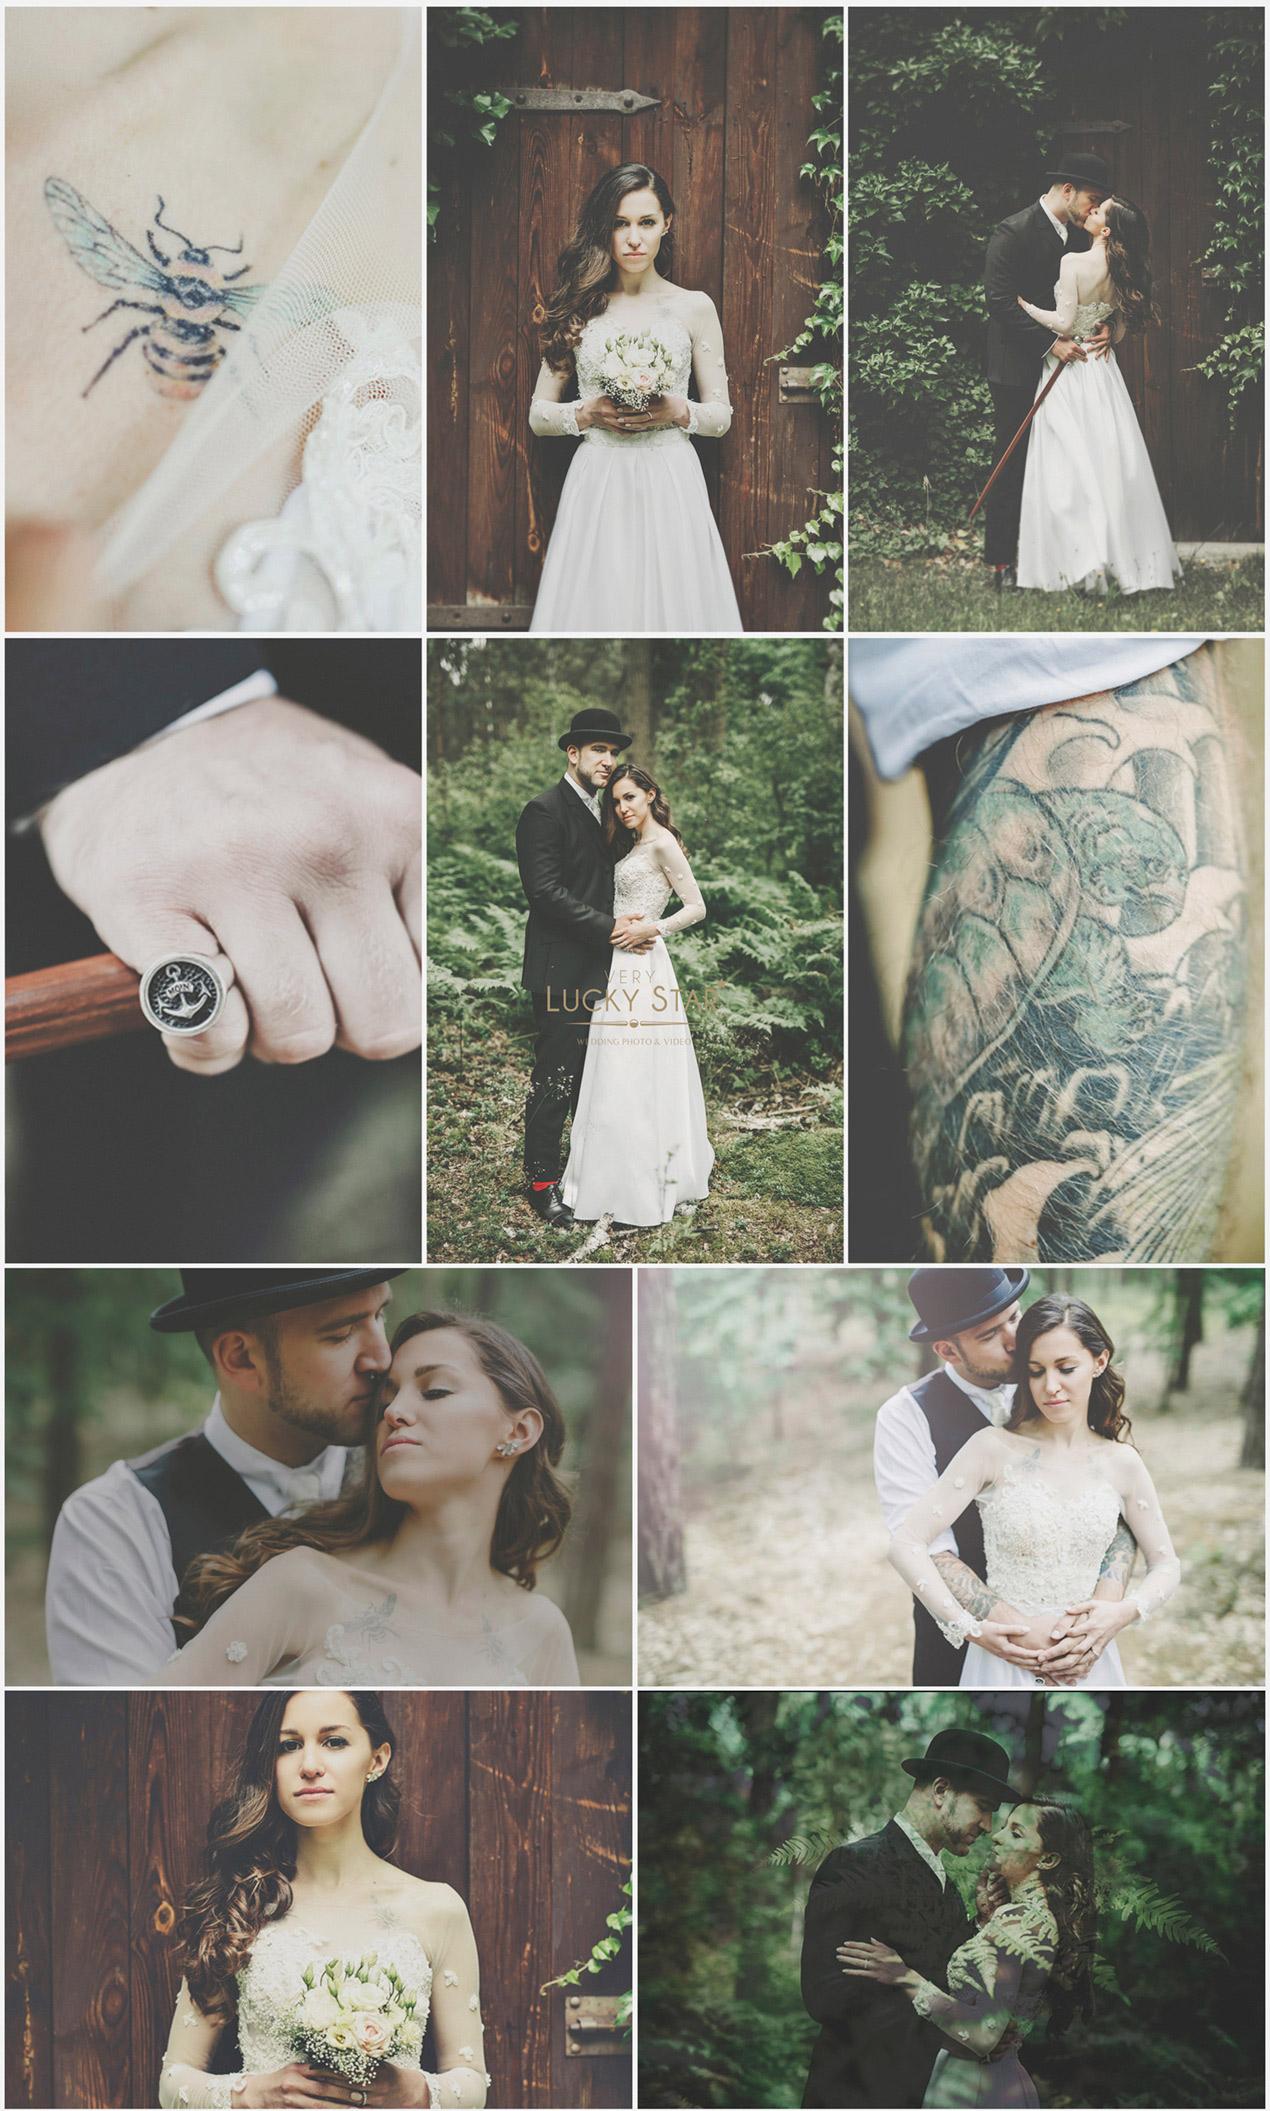 Boho-Vintage-Whimsical-Wedding-Ślub-Fotografia